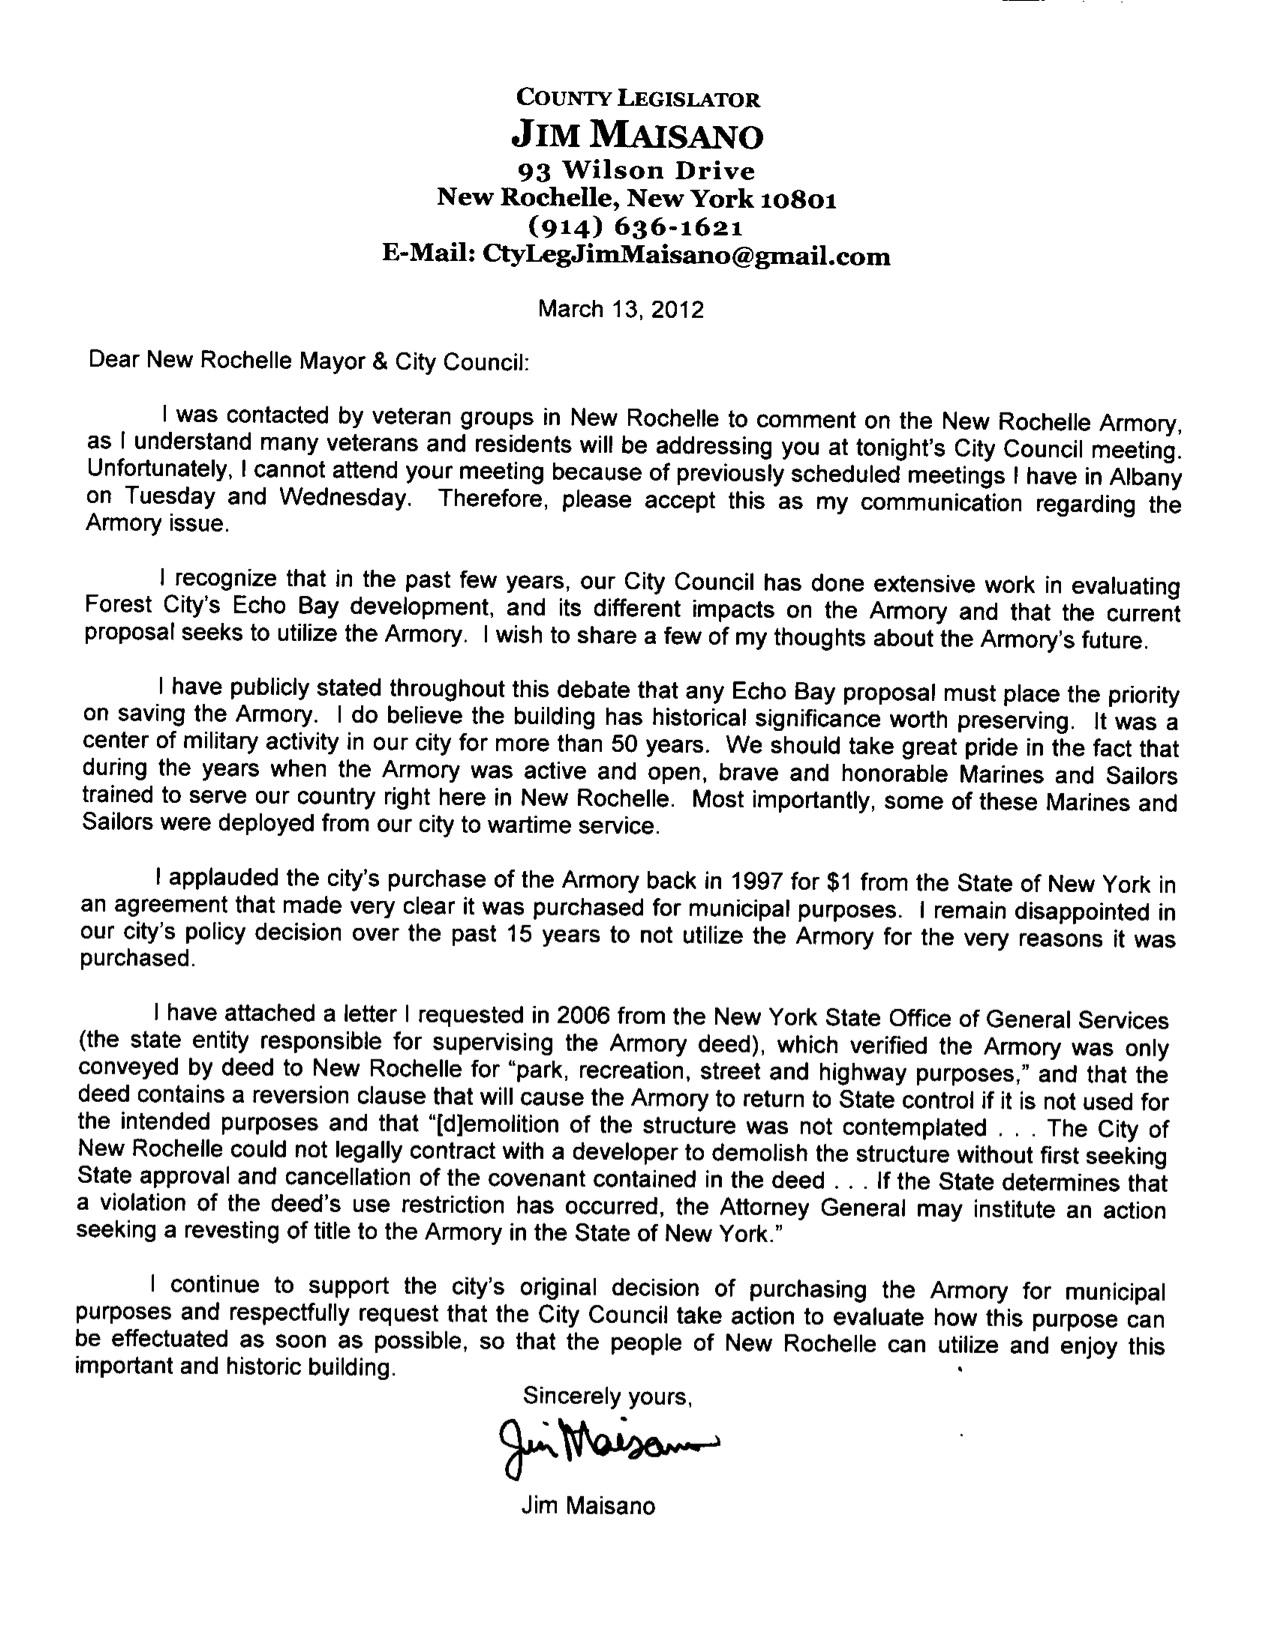 Letter to city council mersnoforum letter to city council spiritdancerdesigns Choice Image